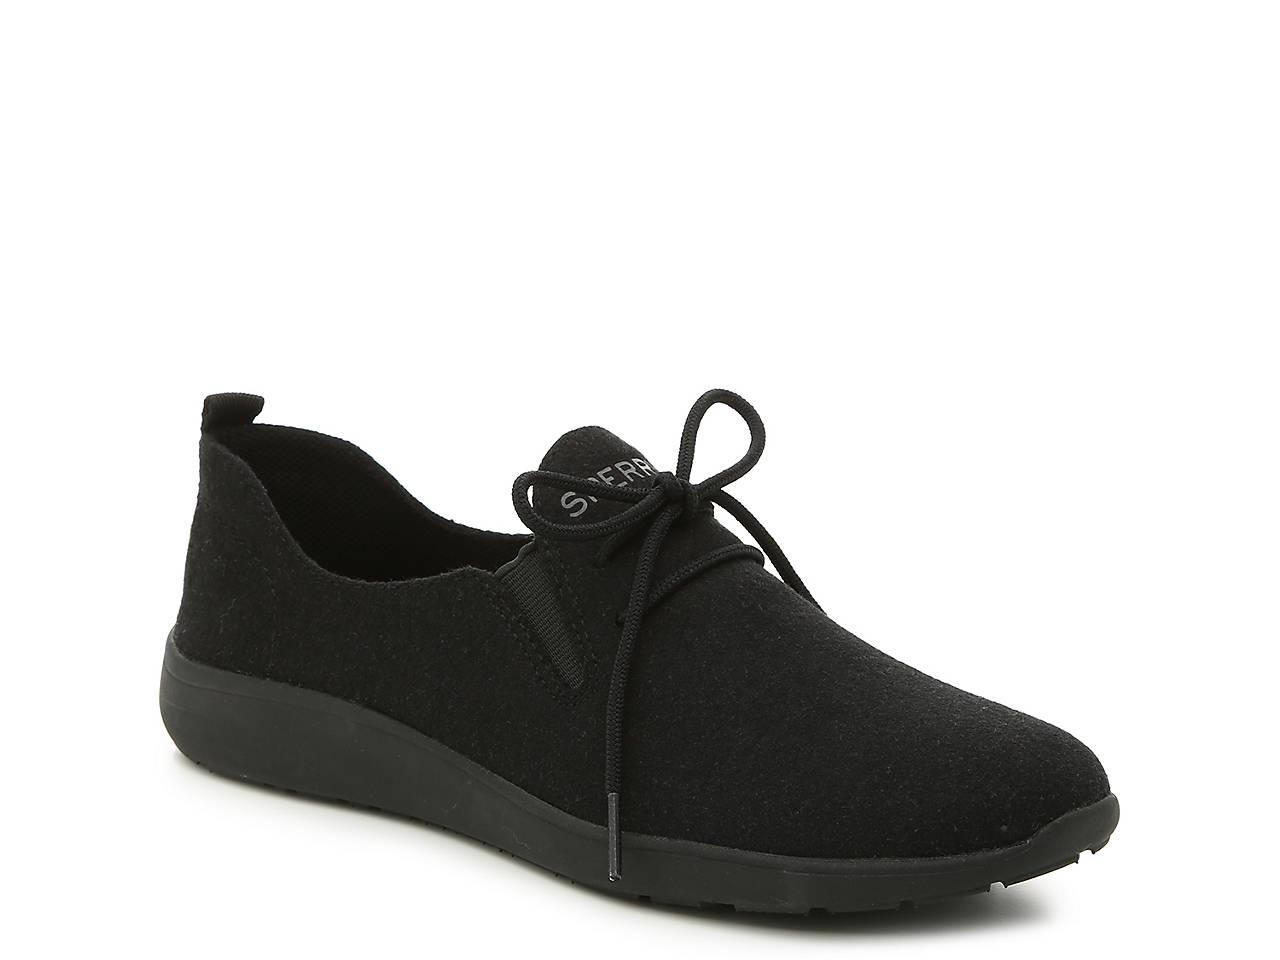 c47105ce15fb Sperry Top-Sider Rio Aqua Slip-On Sneaker Women s Shoes